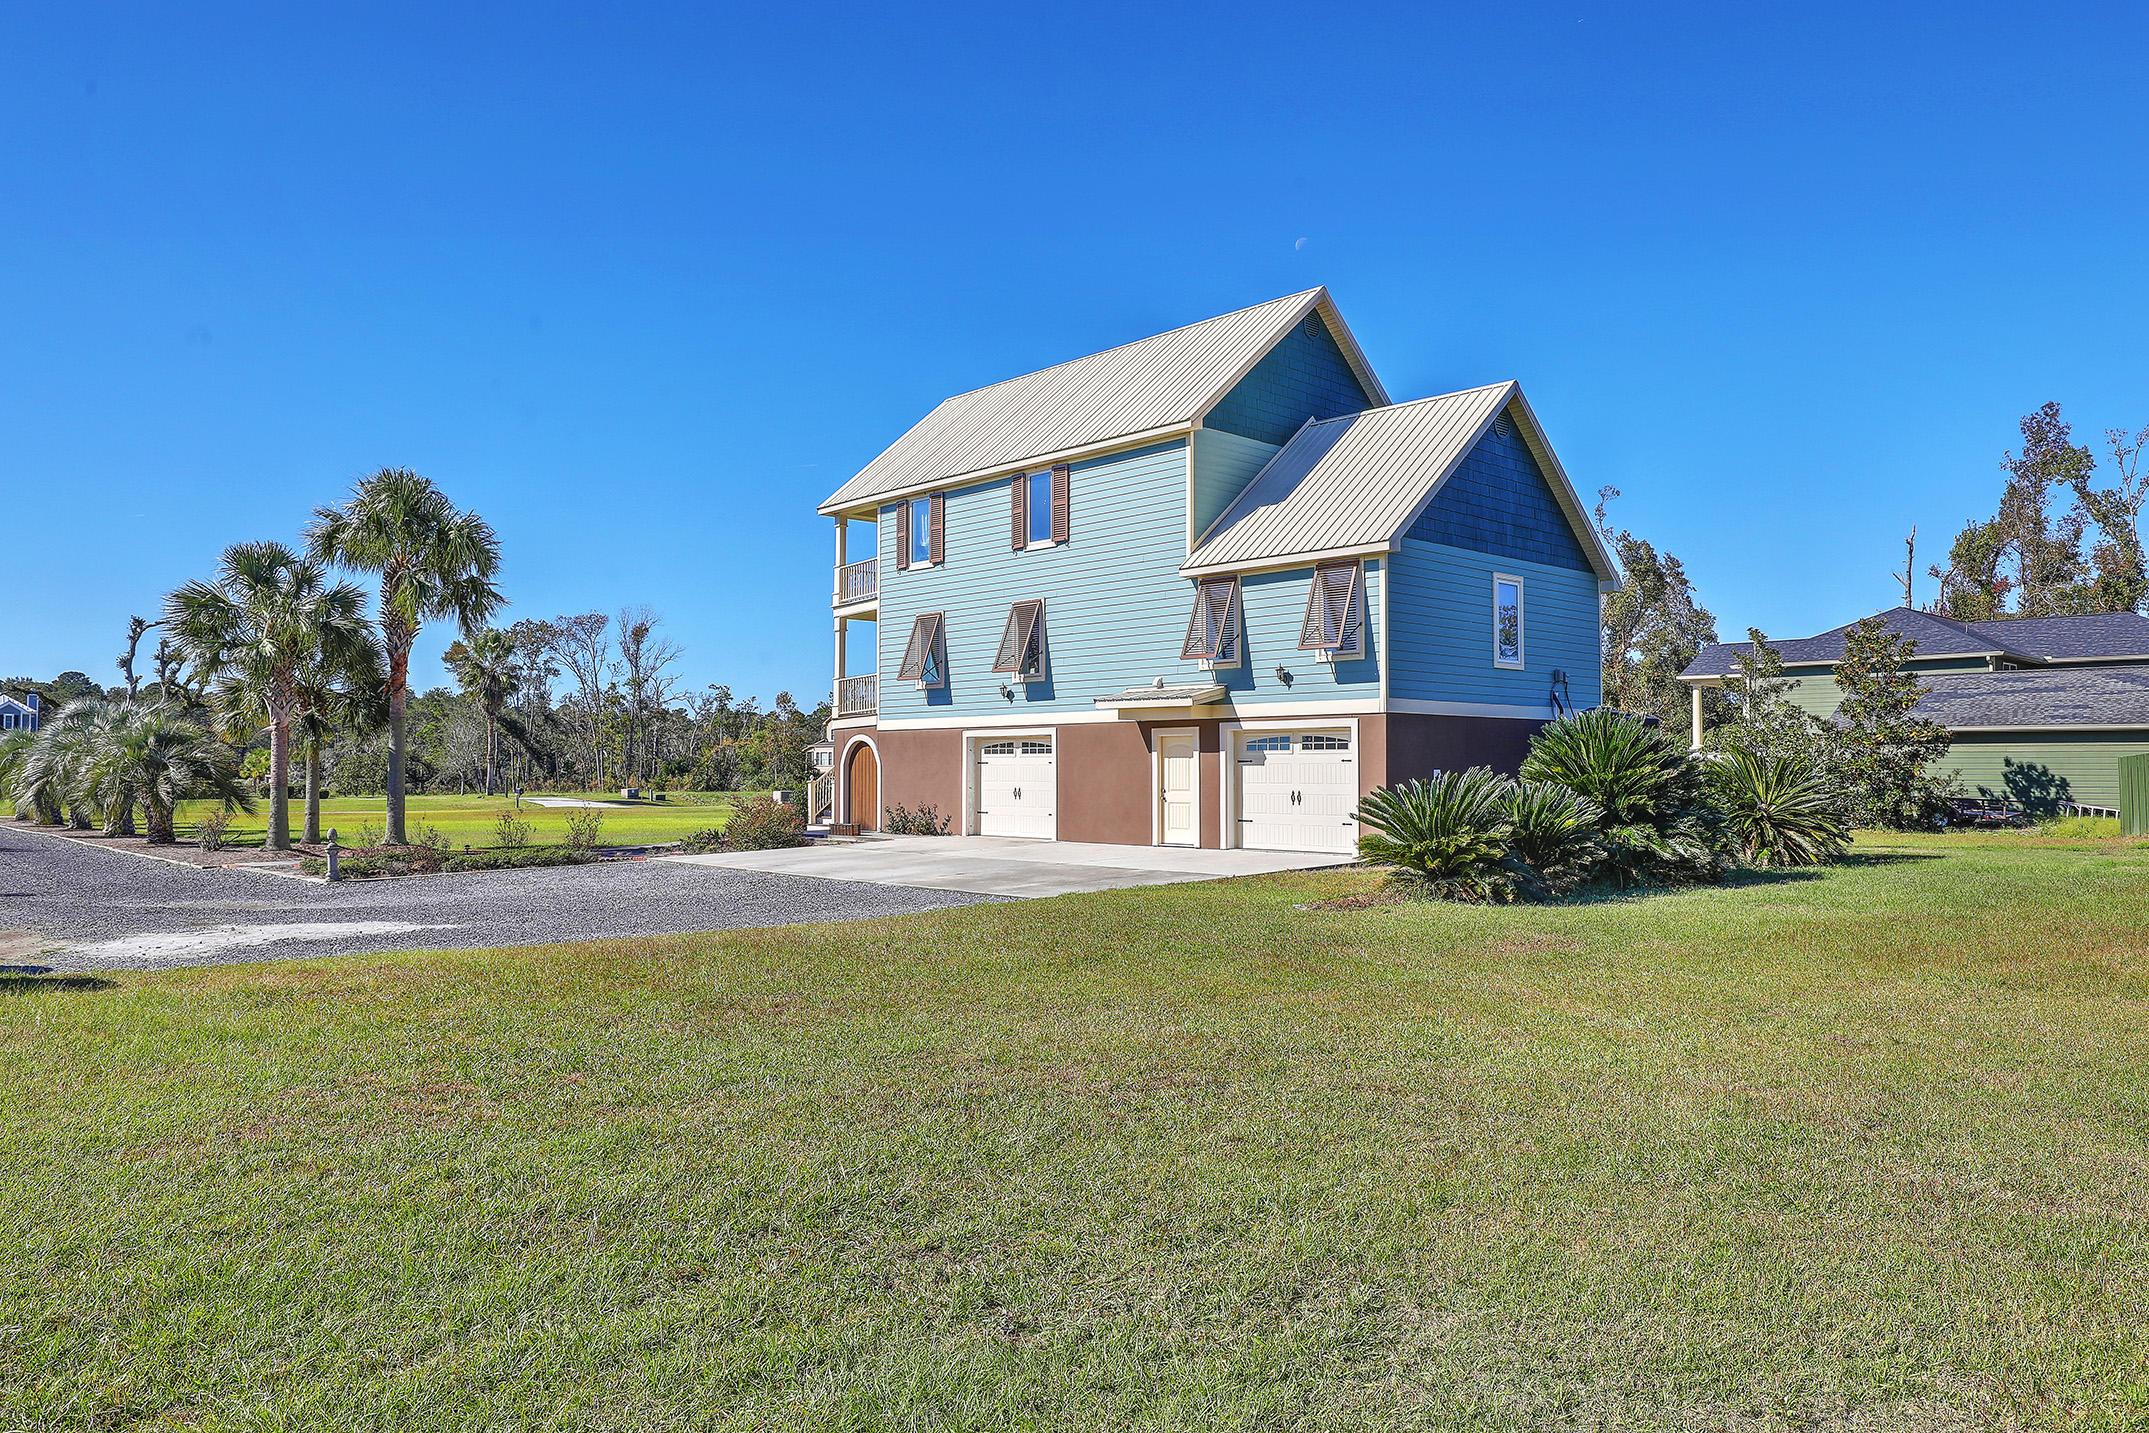 Marshall Creek Homes For Sale - 725 Sonny Boy, Johns Island, SC - 29